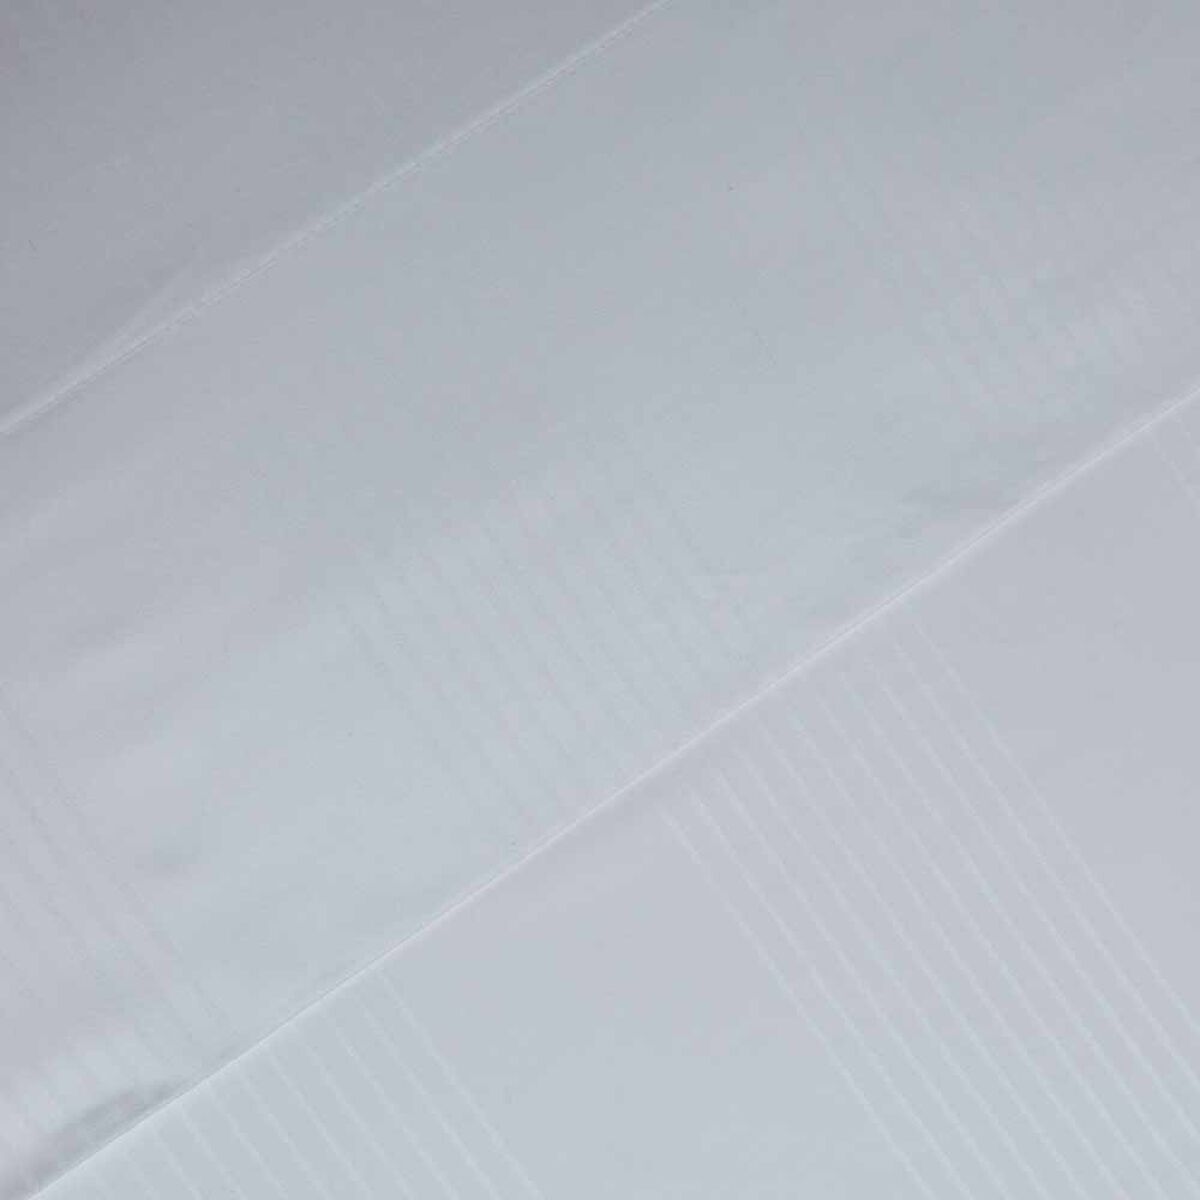 Jgo Sabana RS Dobby 500H S/C Lines White 2.0